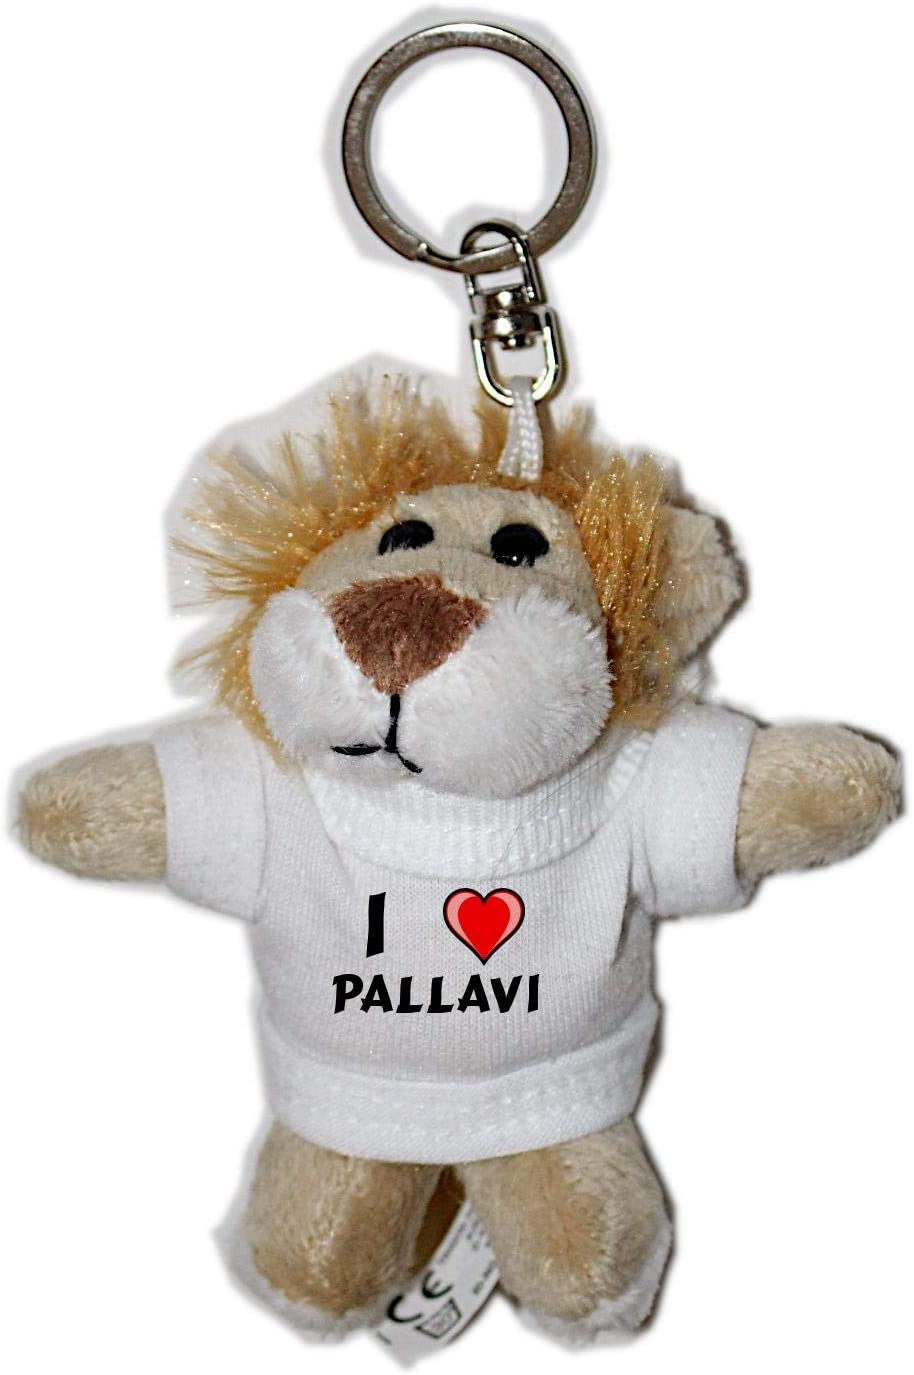 Amazon.com: León – Llavero de peluche con I Love Pallavi ...